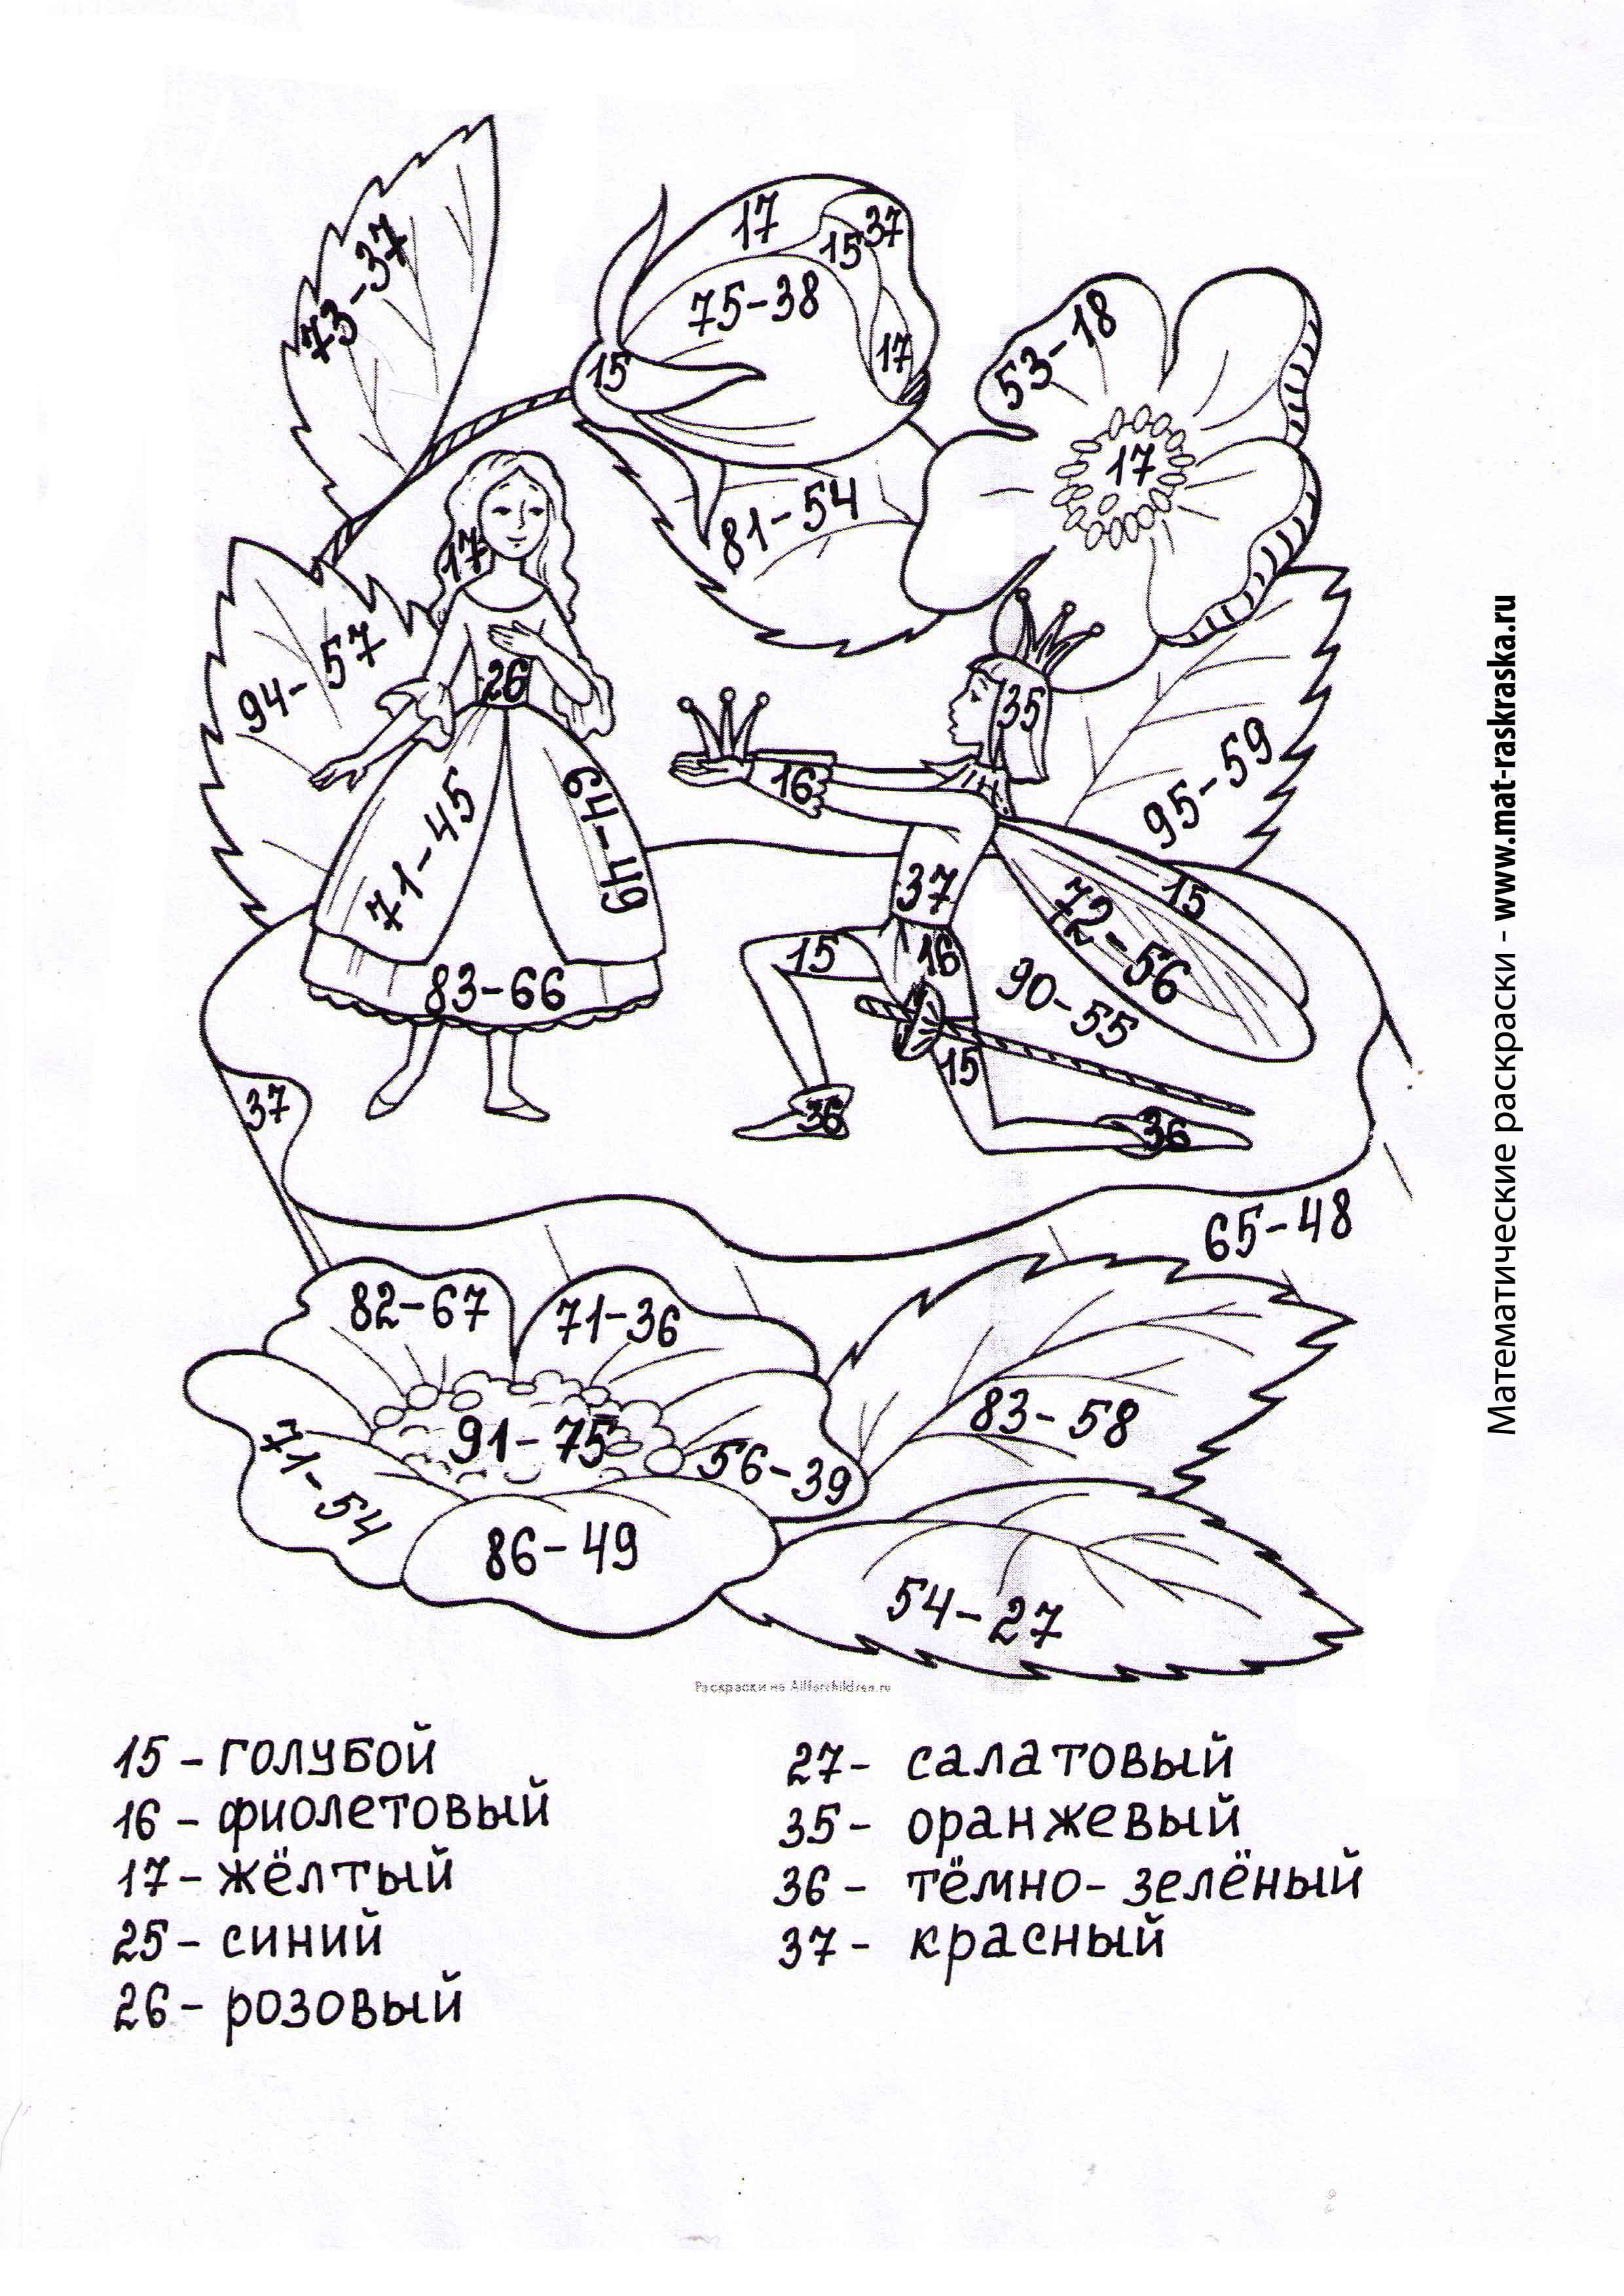 http://www.mat-raskraska.ru/images/stories/Raskraski/Sloz-vichit-v-predelah100/duimovoch-i-elf-vichit-2zn-s-pereh10-ras1_big.jpg